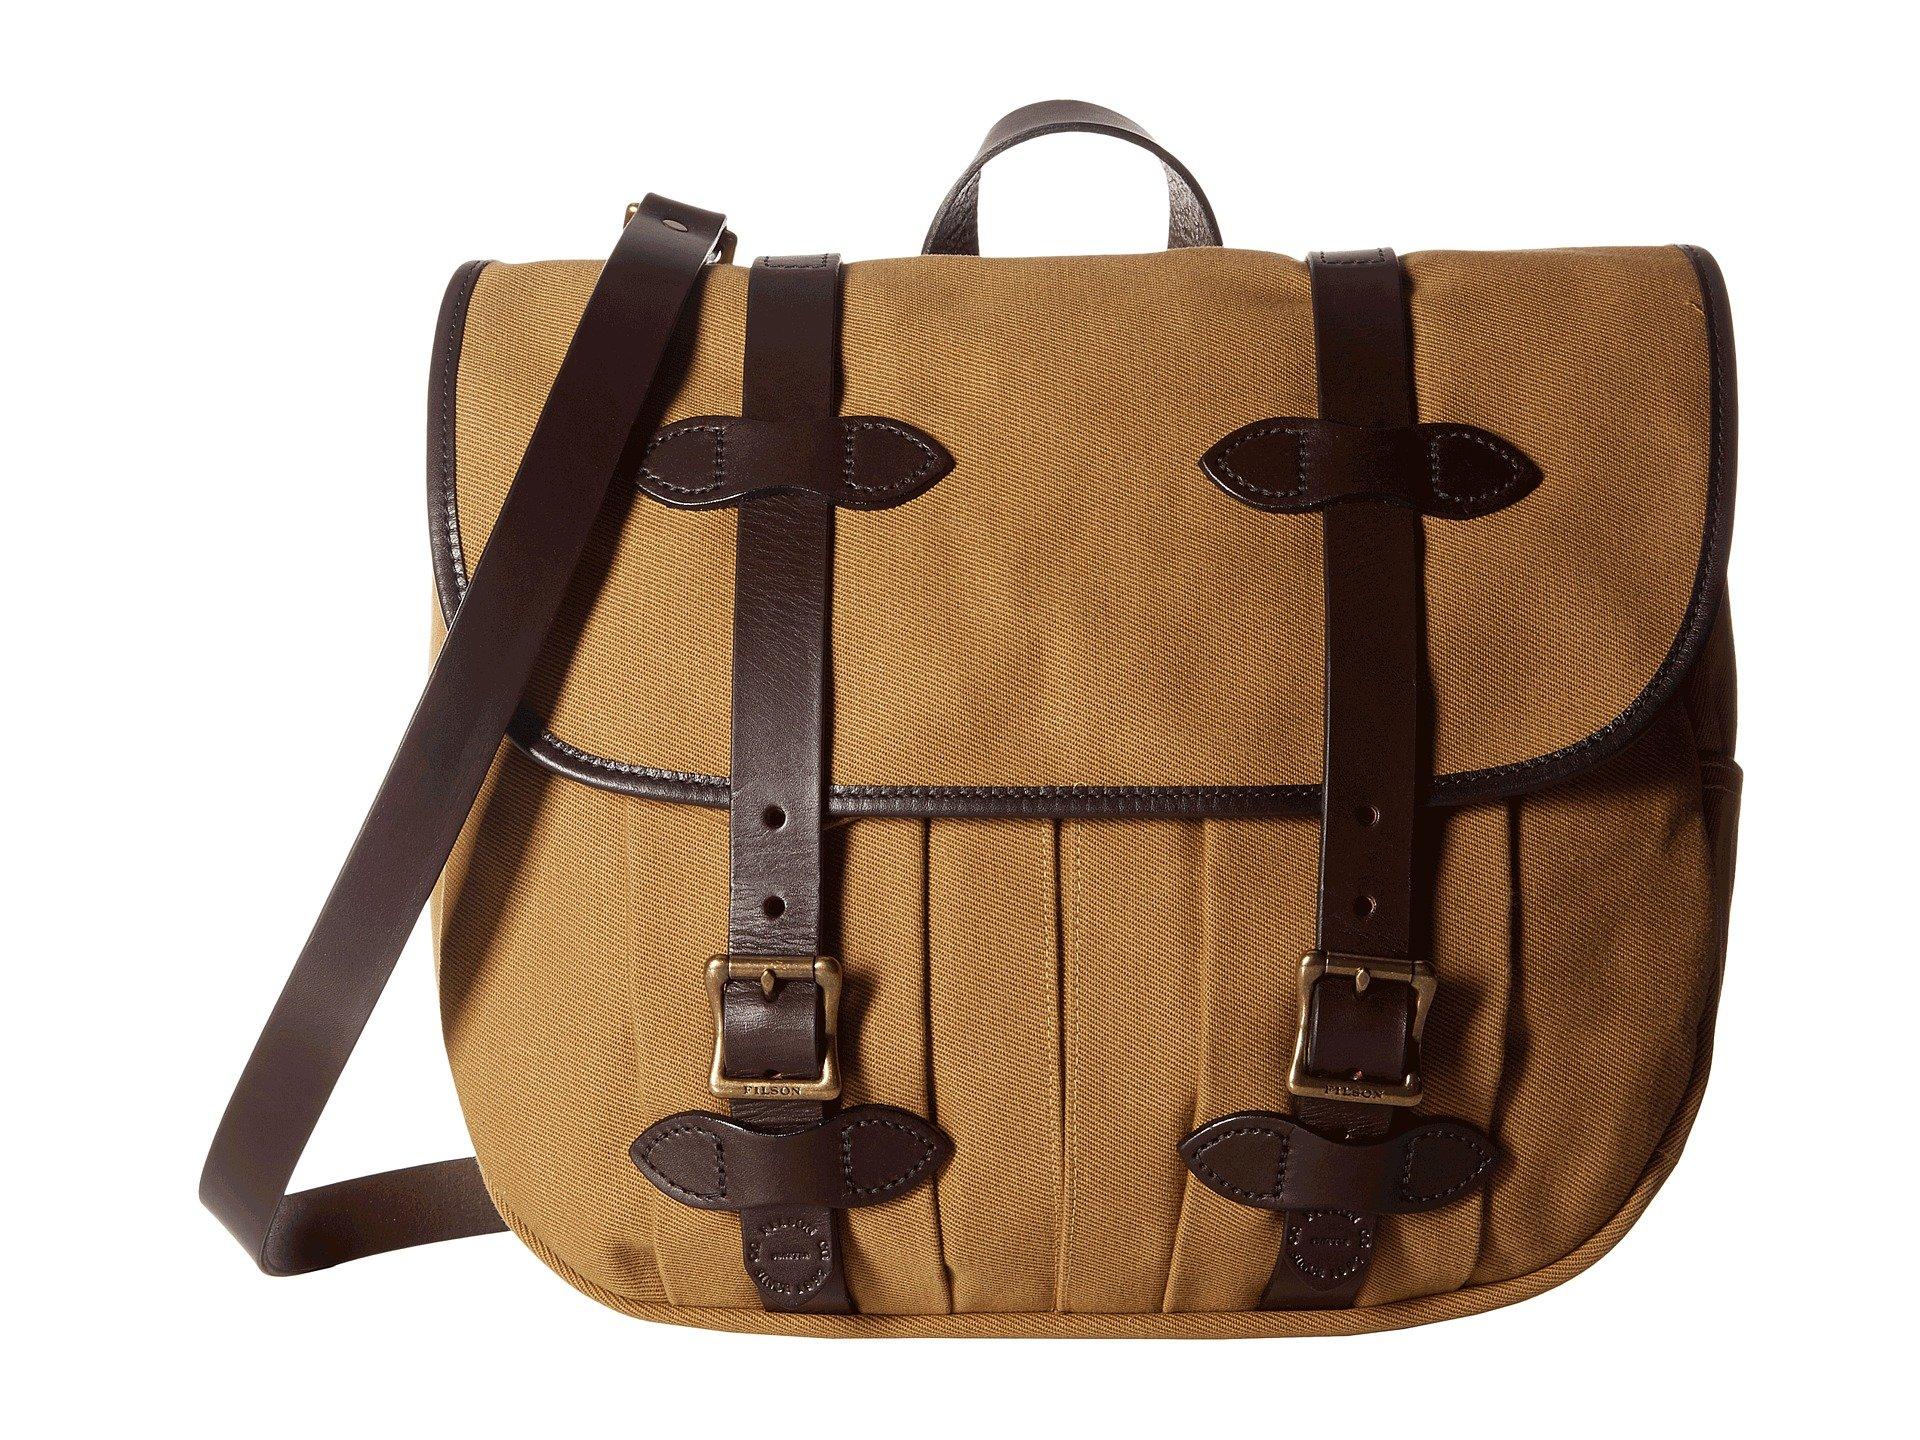 Filson Unisex Medium Field Bag Tan 1 One Size